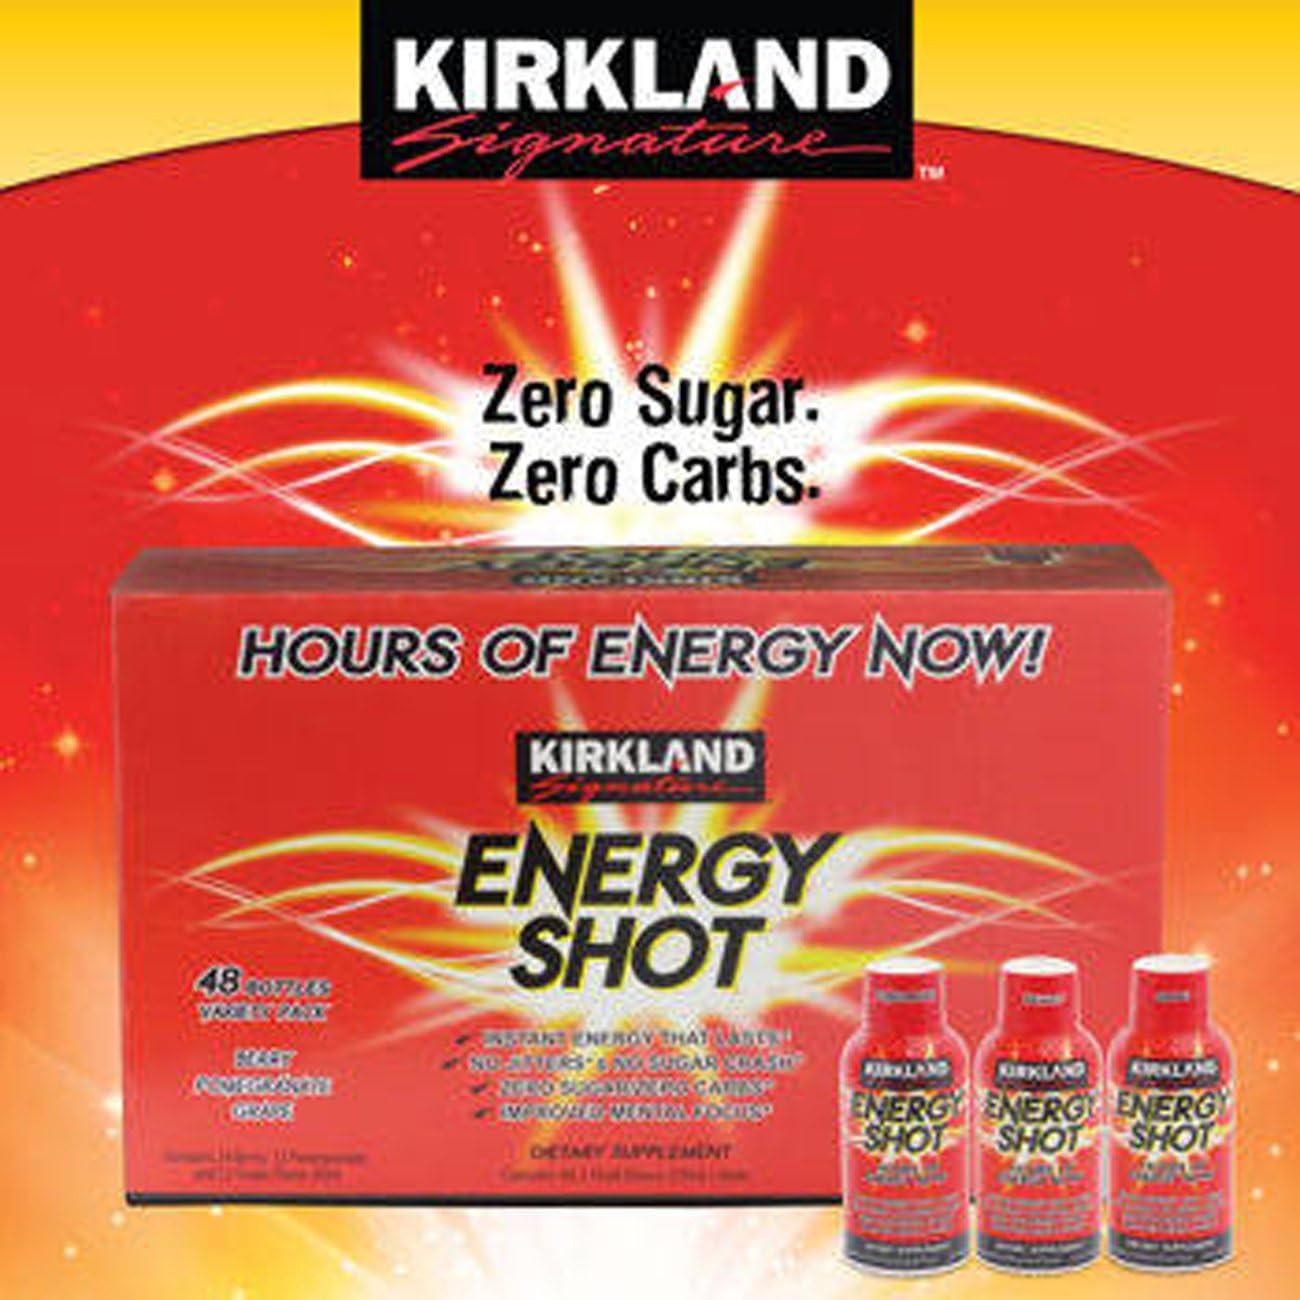 Kirkland Signature™ Energy Shot 48 Count, 2 Ounces Each: Health & Personal Care